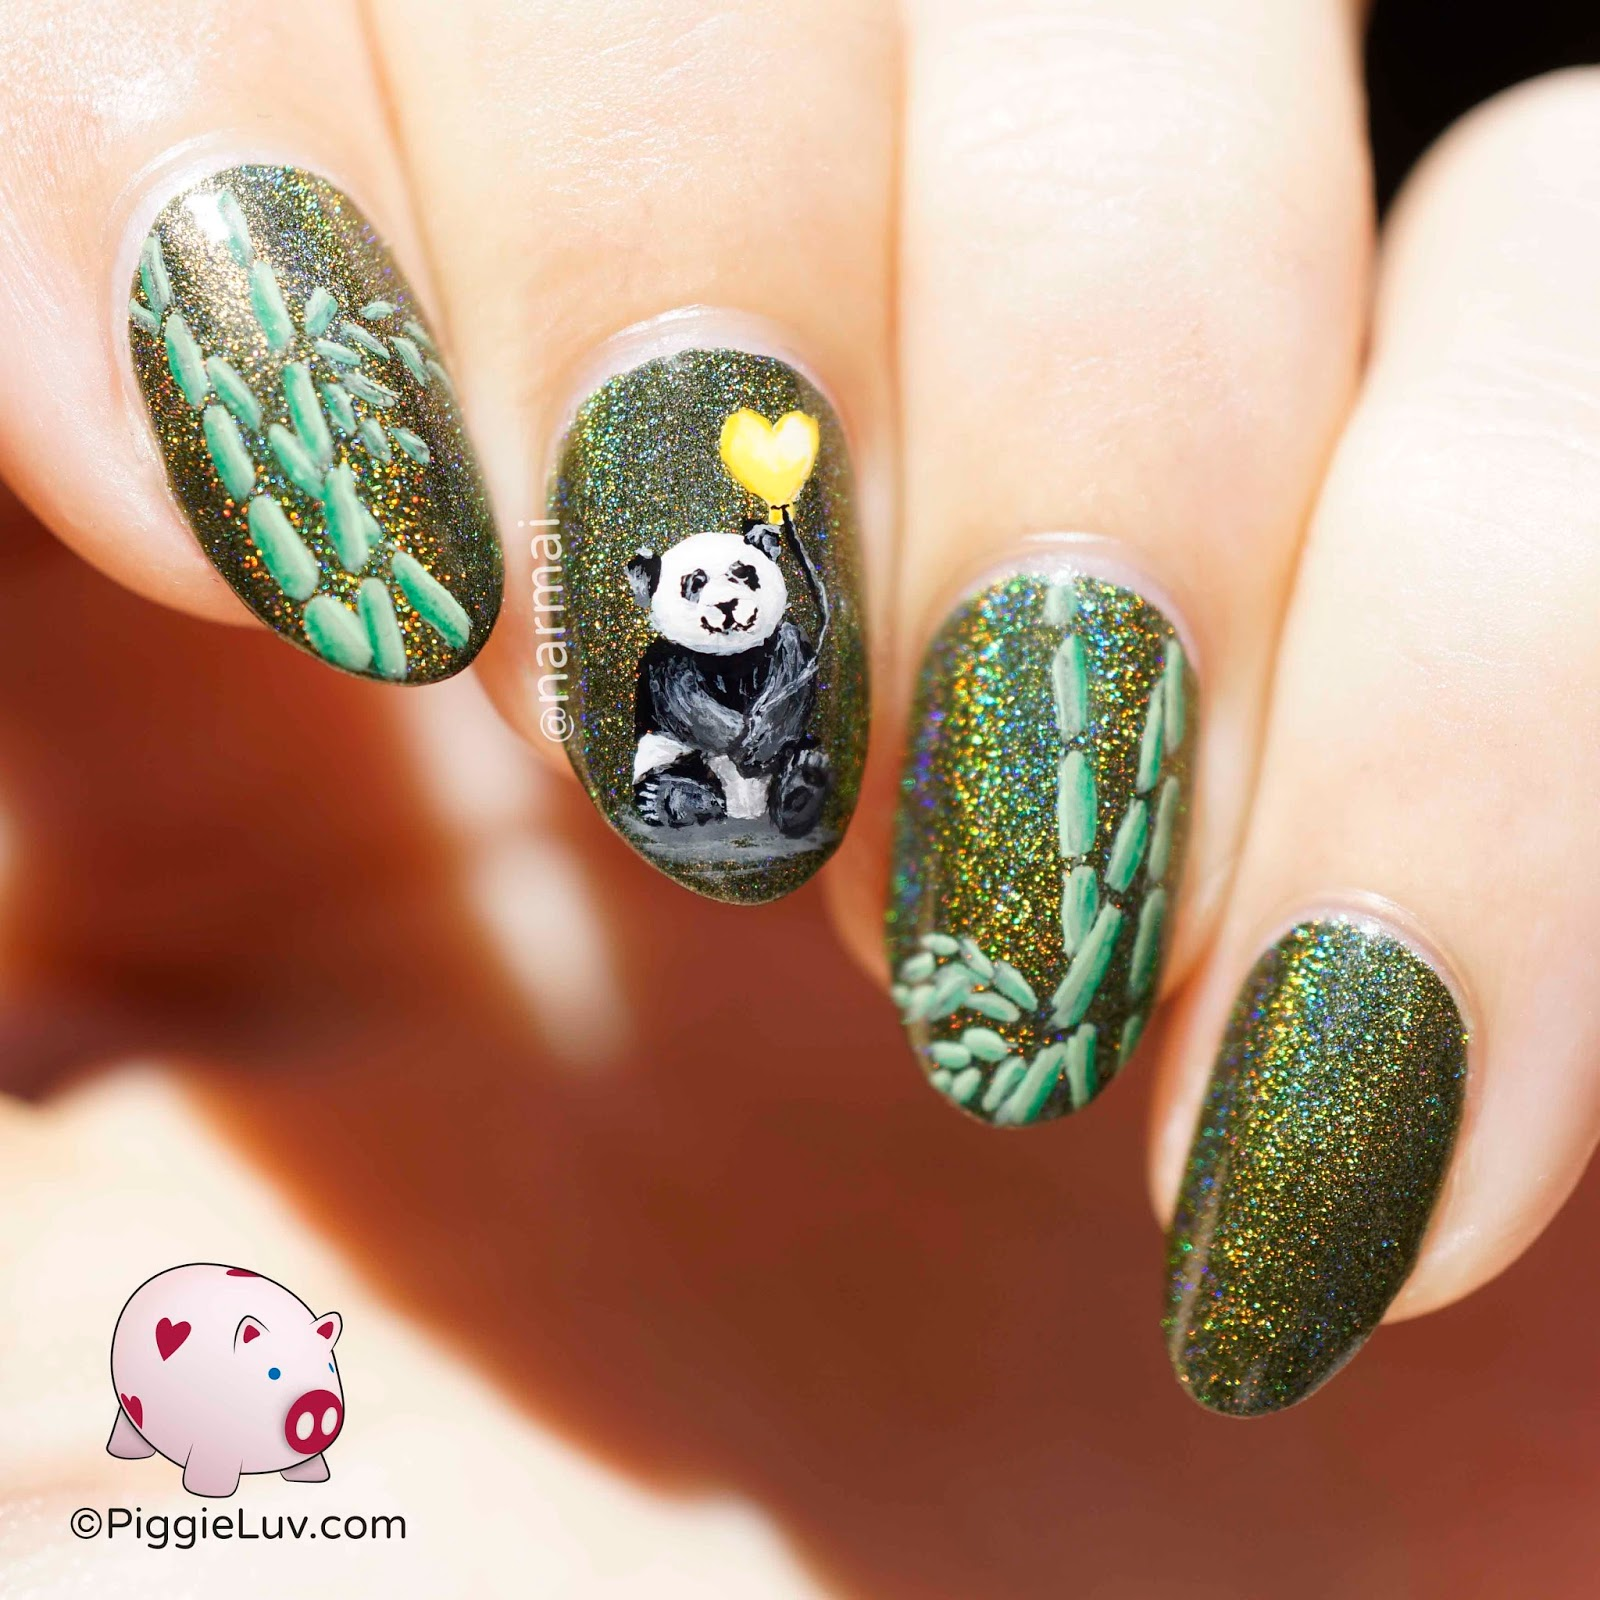 Piggieluv little panda nail art little panda nail art prinsesfo Choice Image